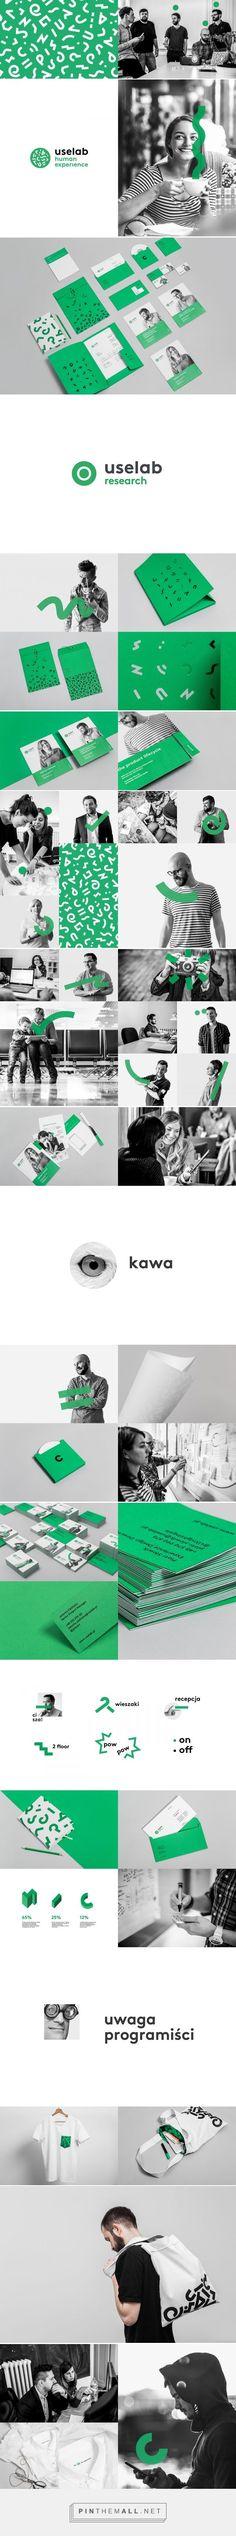 Brand identity, packaging & branding we like Corporate Design, Brand Identity Design, Graphic Design Branding, Corporate Identity, Visual Identity, Logo Design, Brochure Design, Type Design, Typography Design